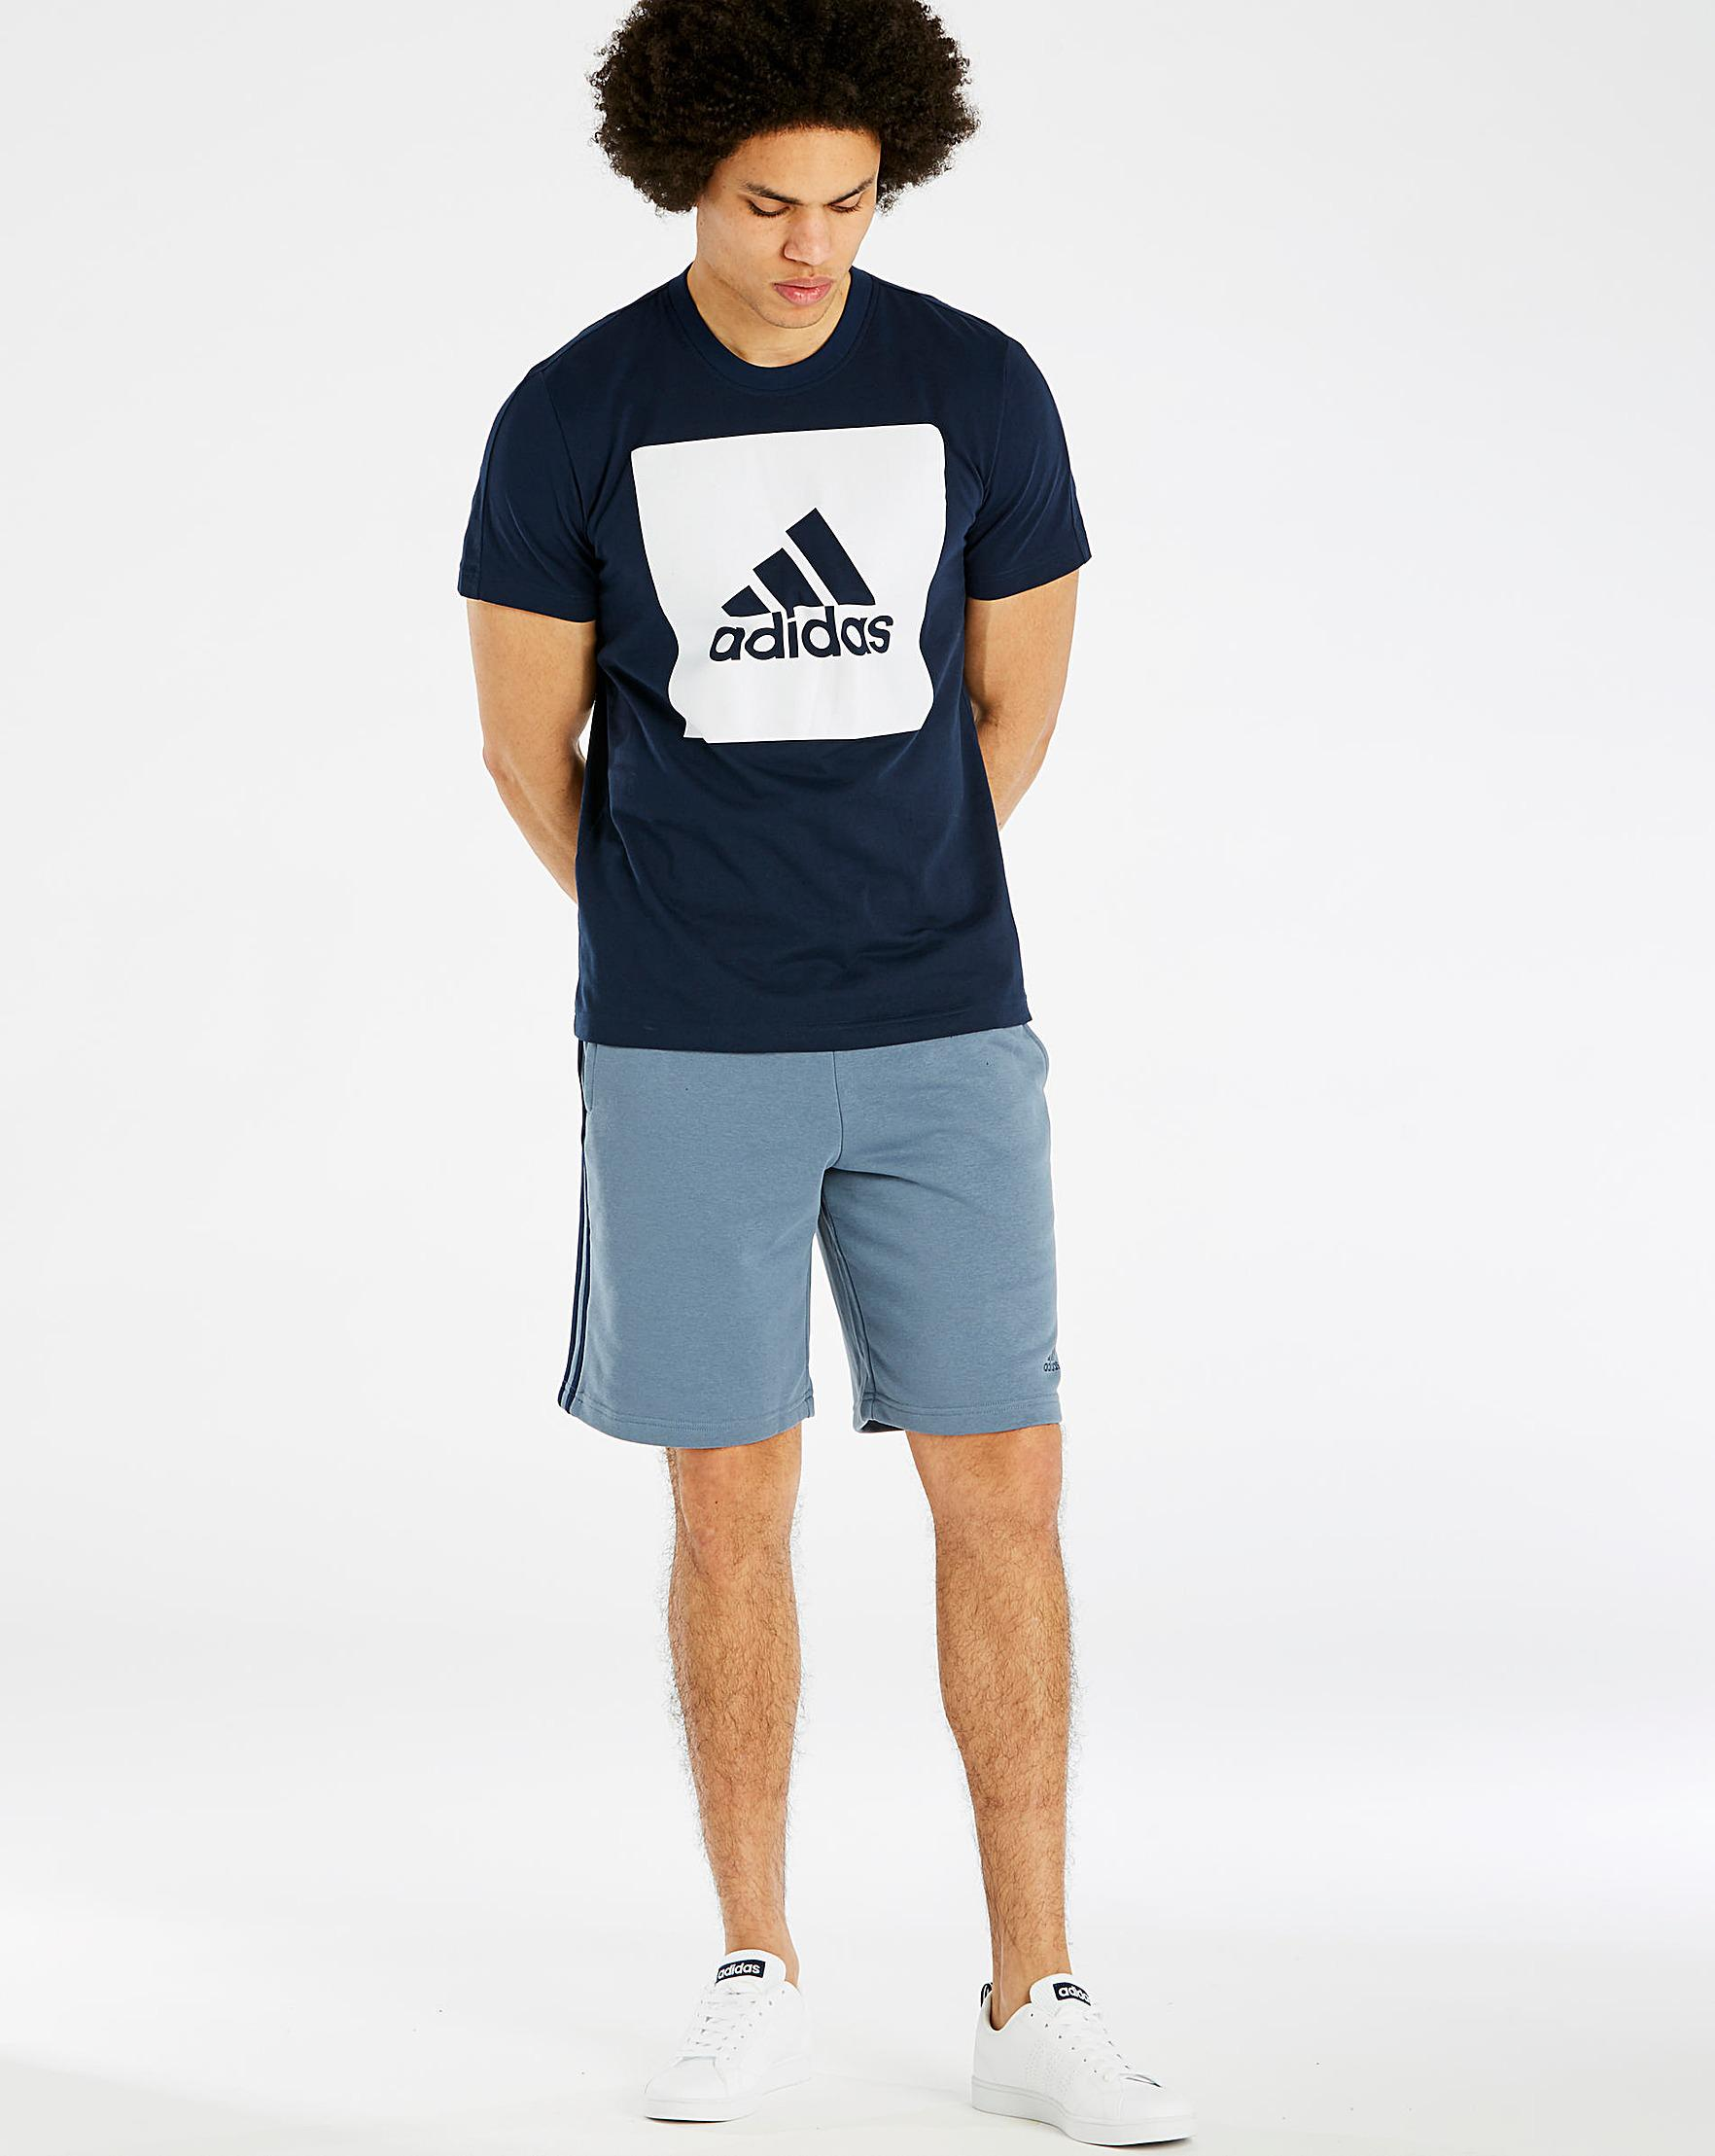 wholesale dealer e6e7f dec99 Adidas Big Logo Tee in Blue for Men - Lyst